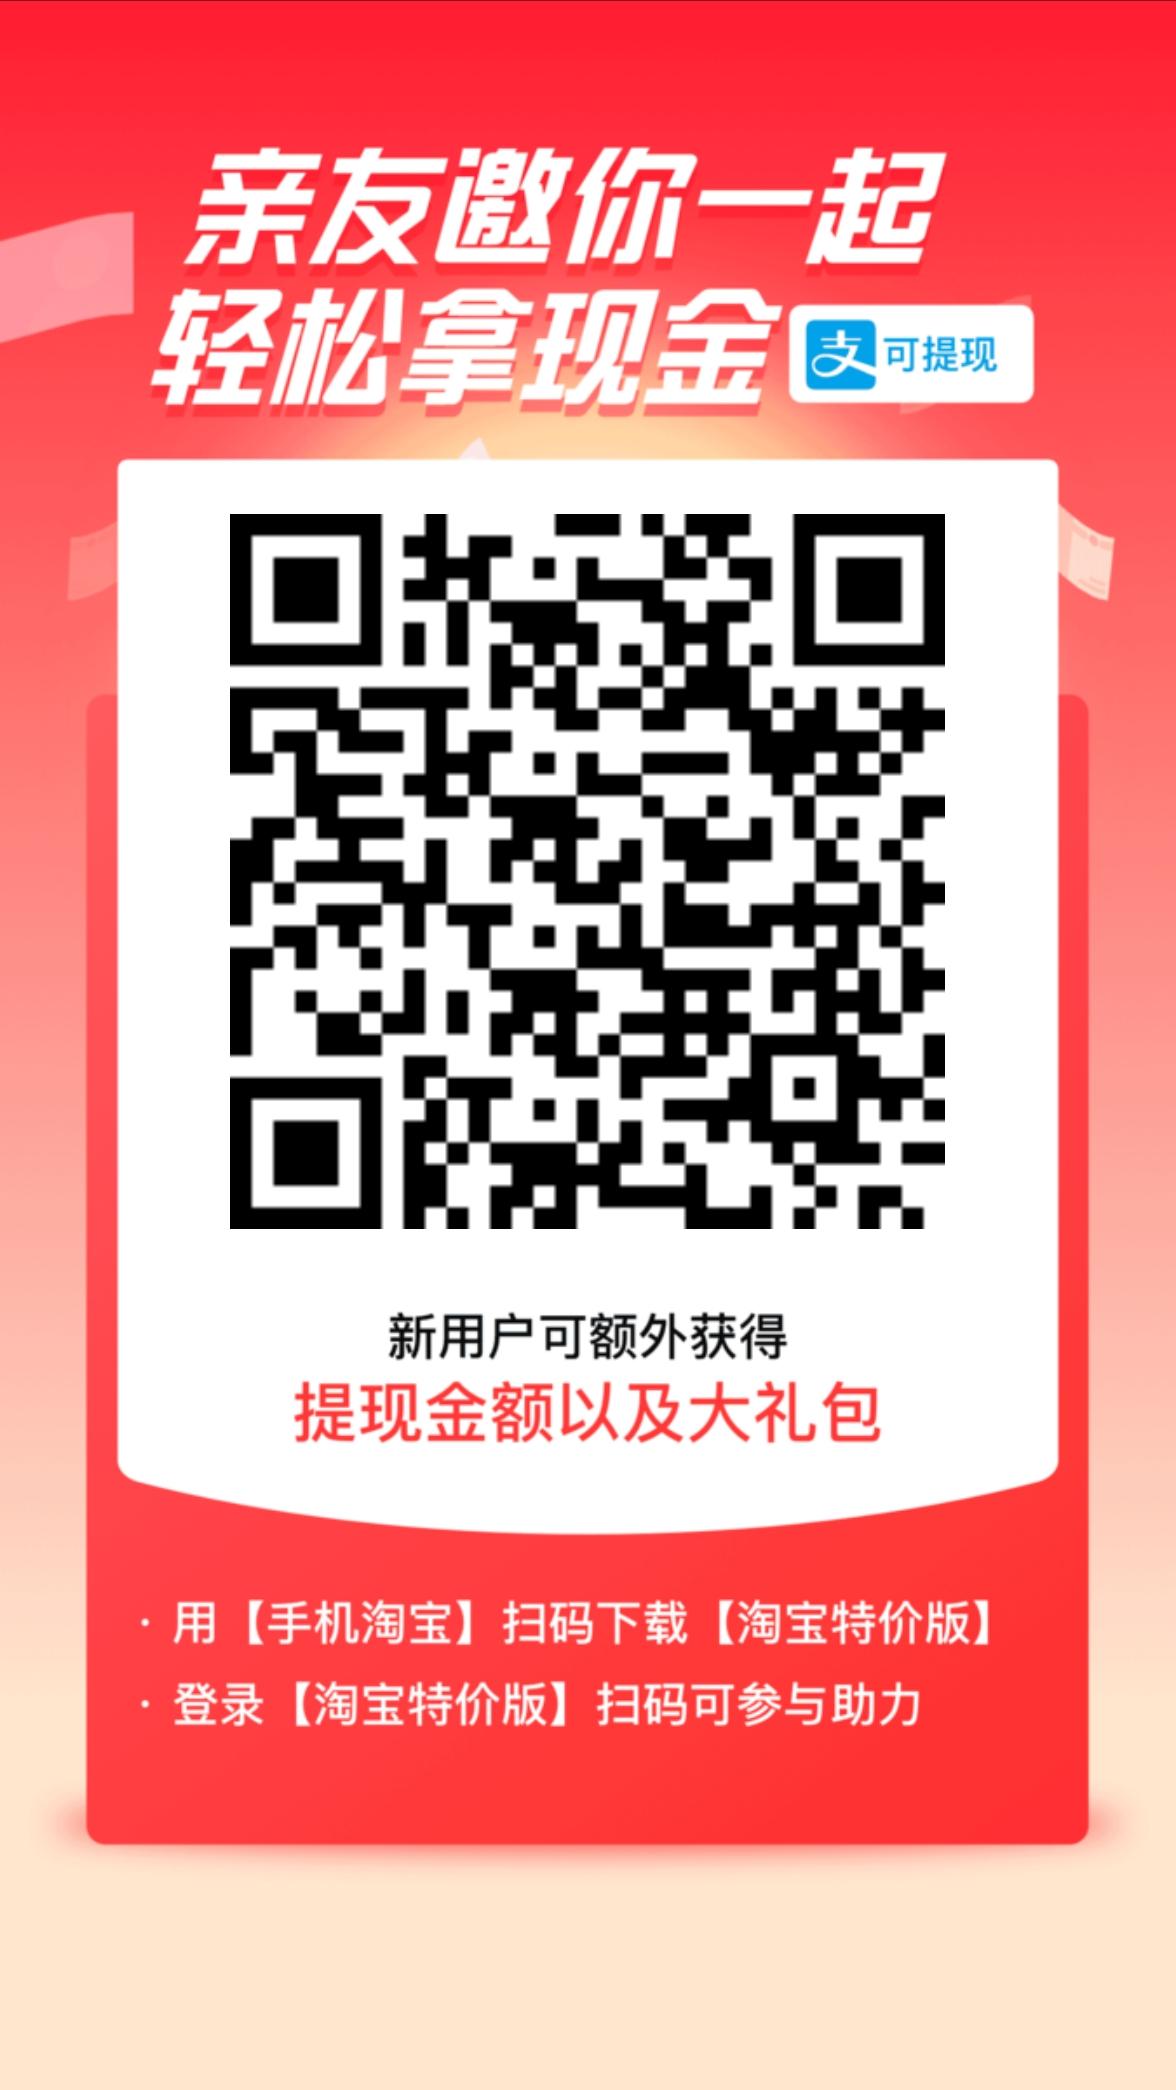 tb_image_share_1602646812170.jpg